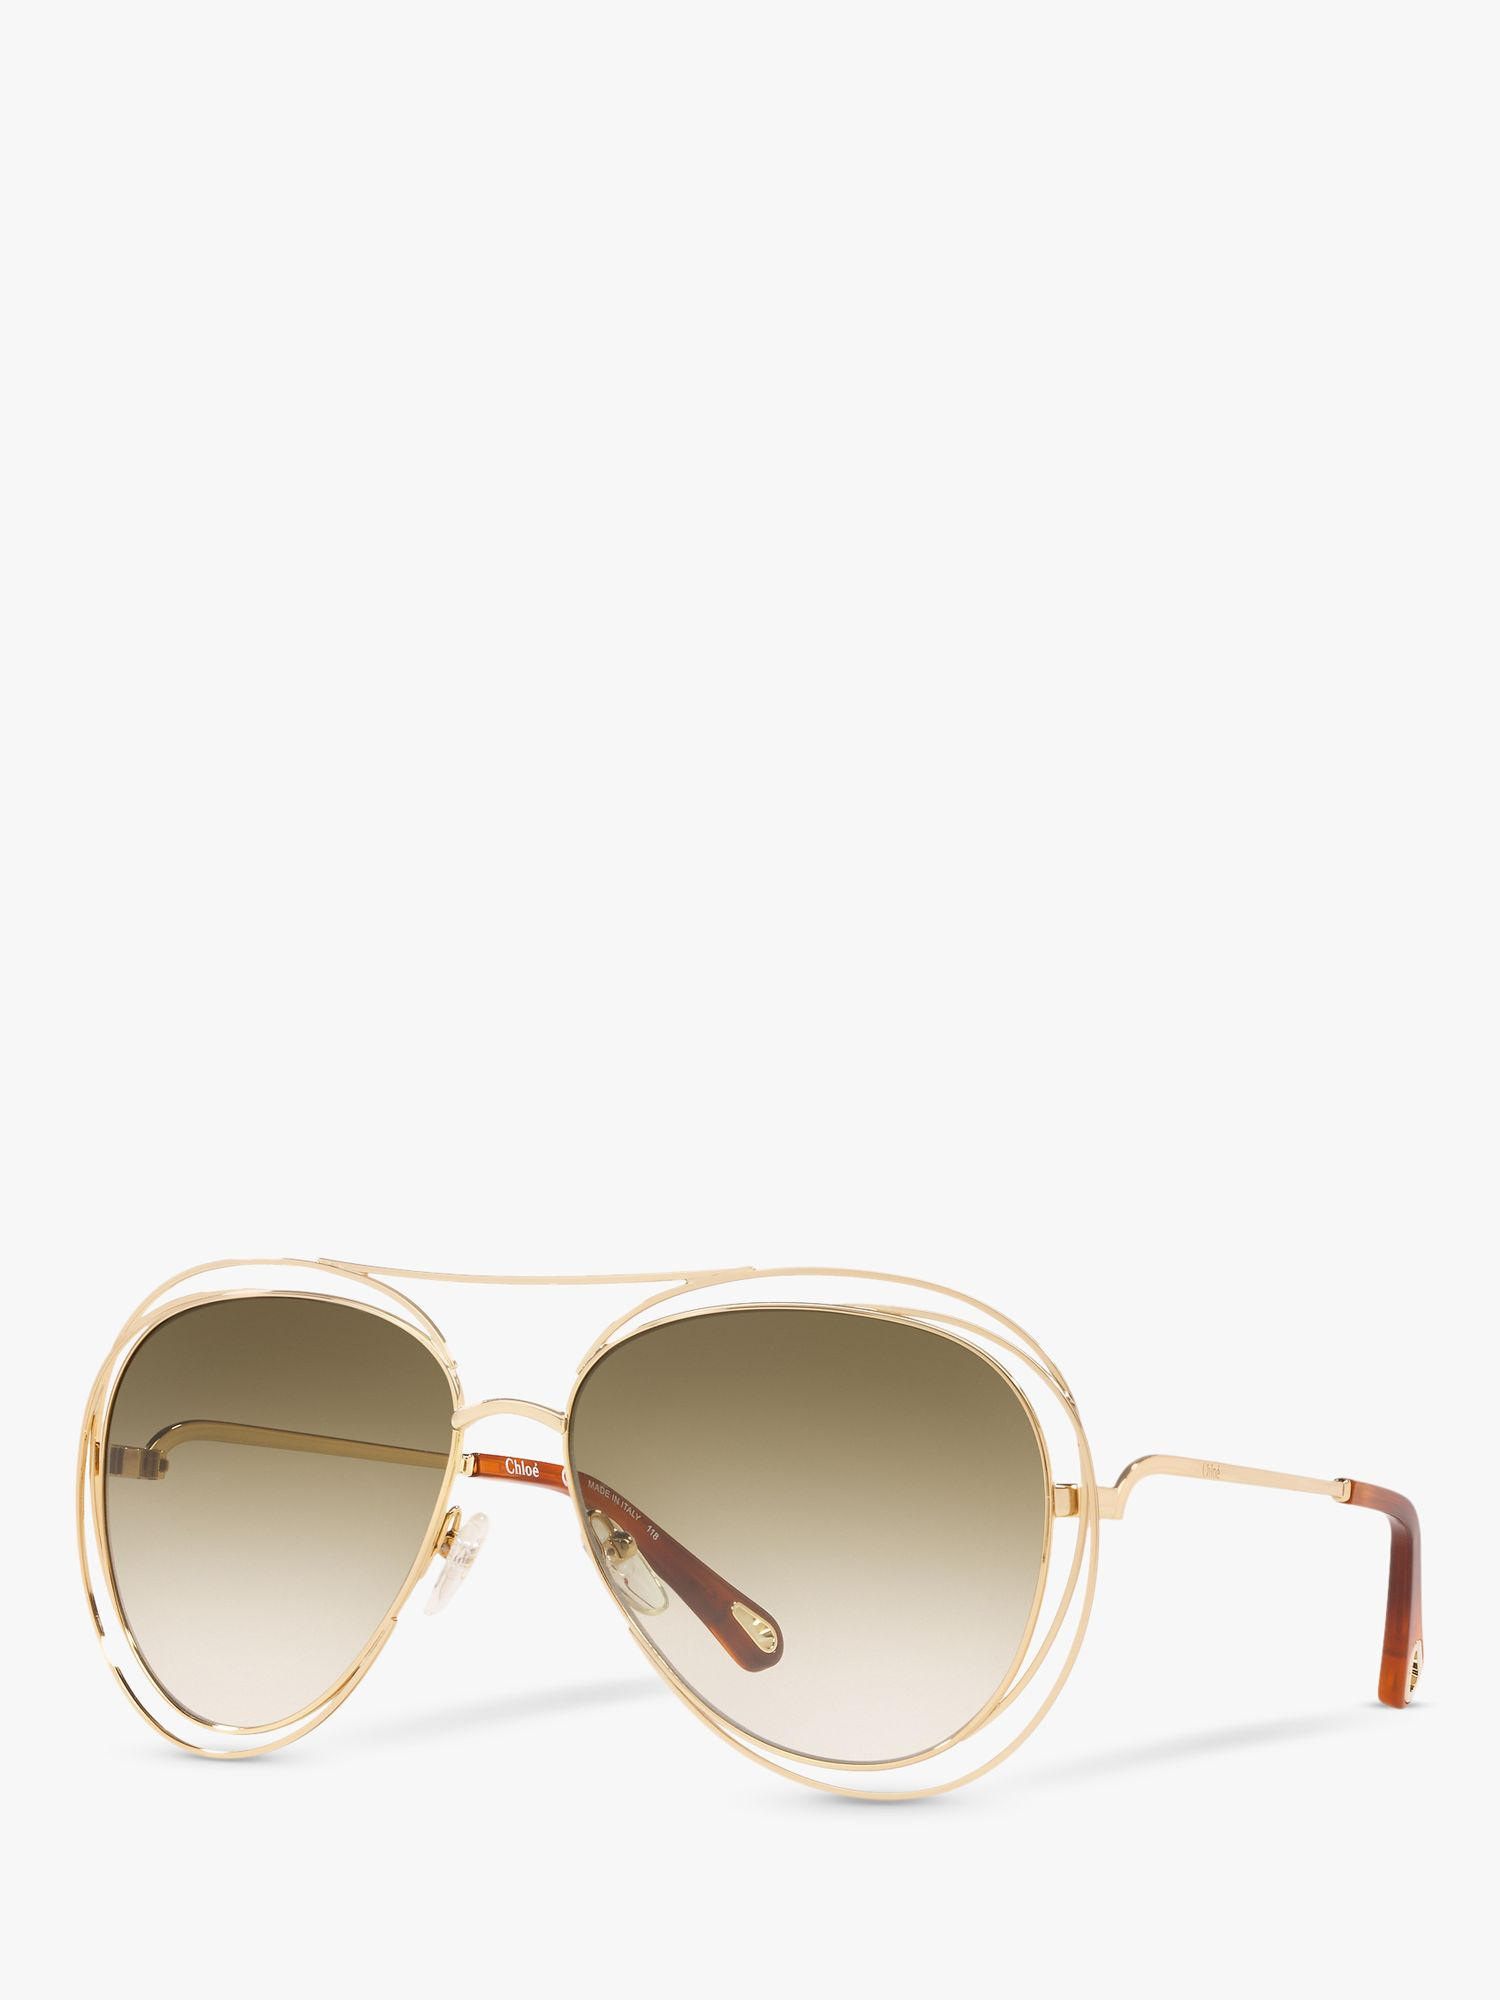 Chloe Chloé CE134S Women's Double Rim Sunglasses